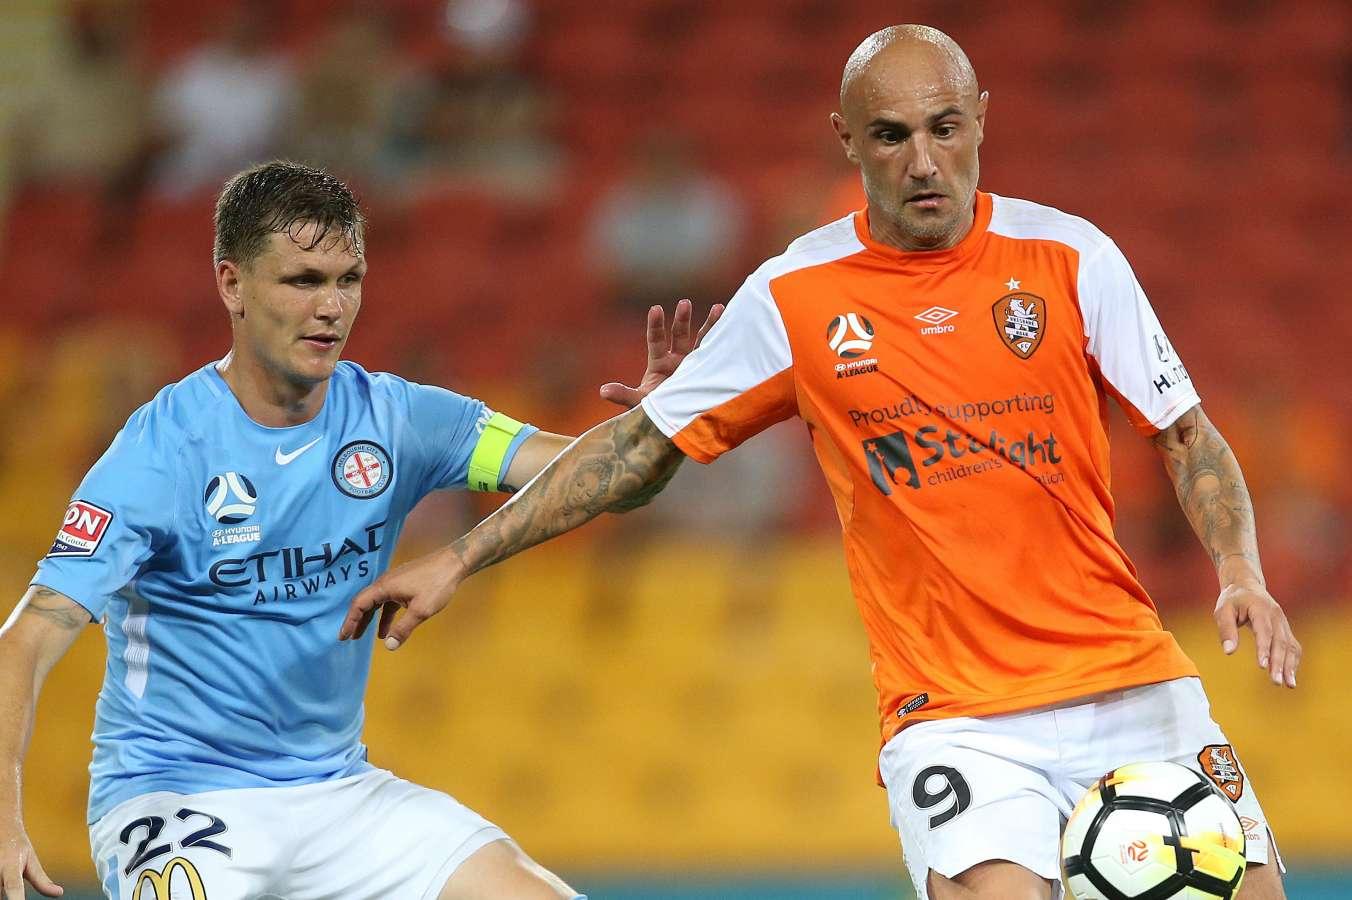 A-League Betting Preview: Elimination Finals - Melbourne teams both favoured